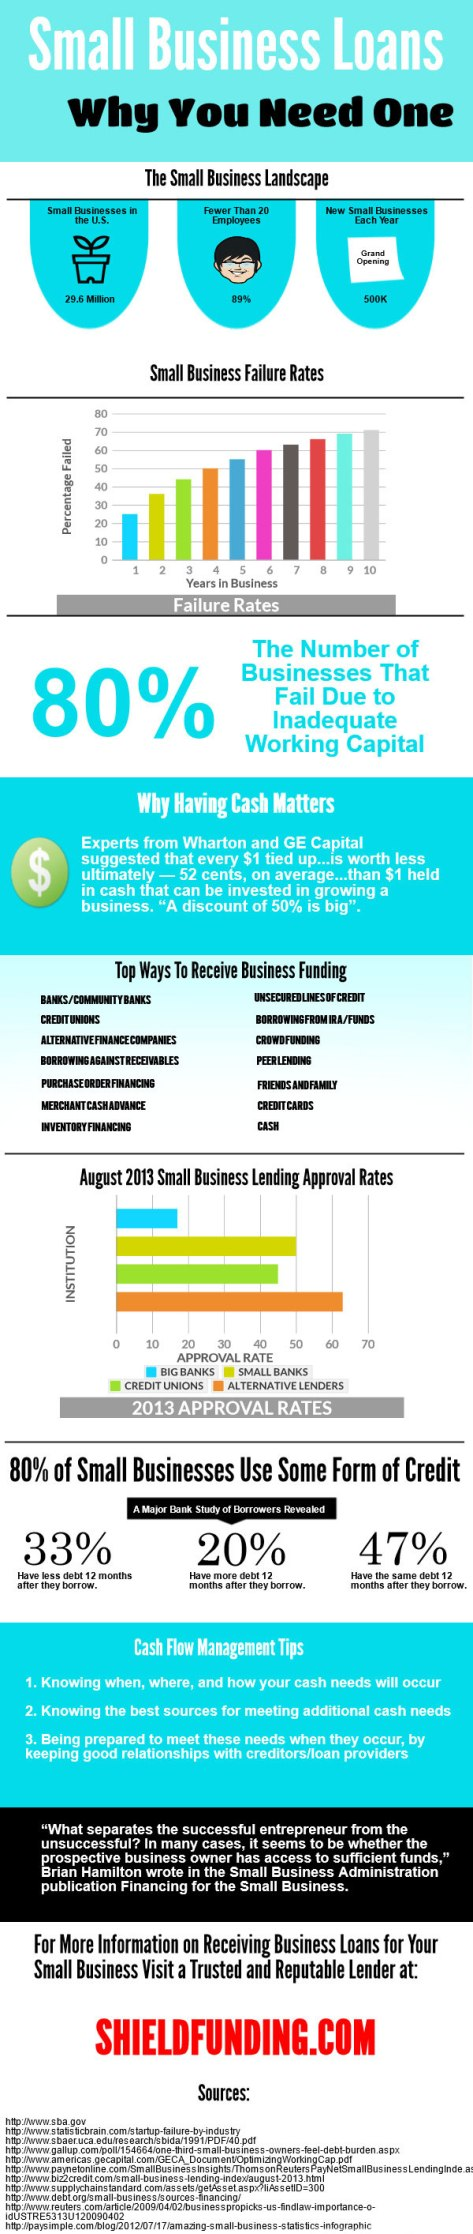 Business Loans At Shield Fundingcom